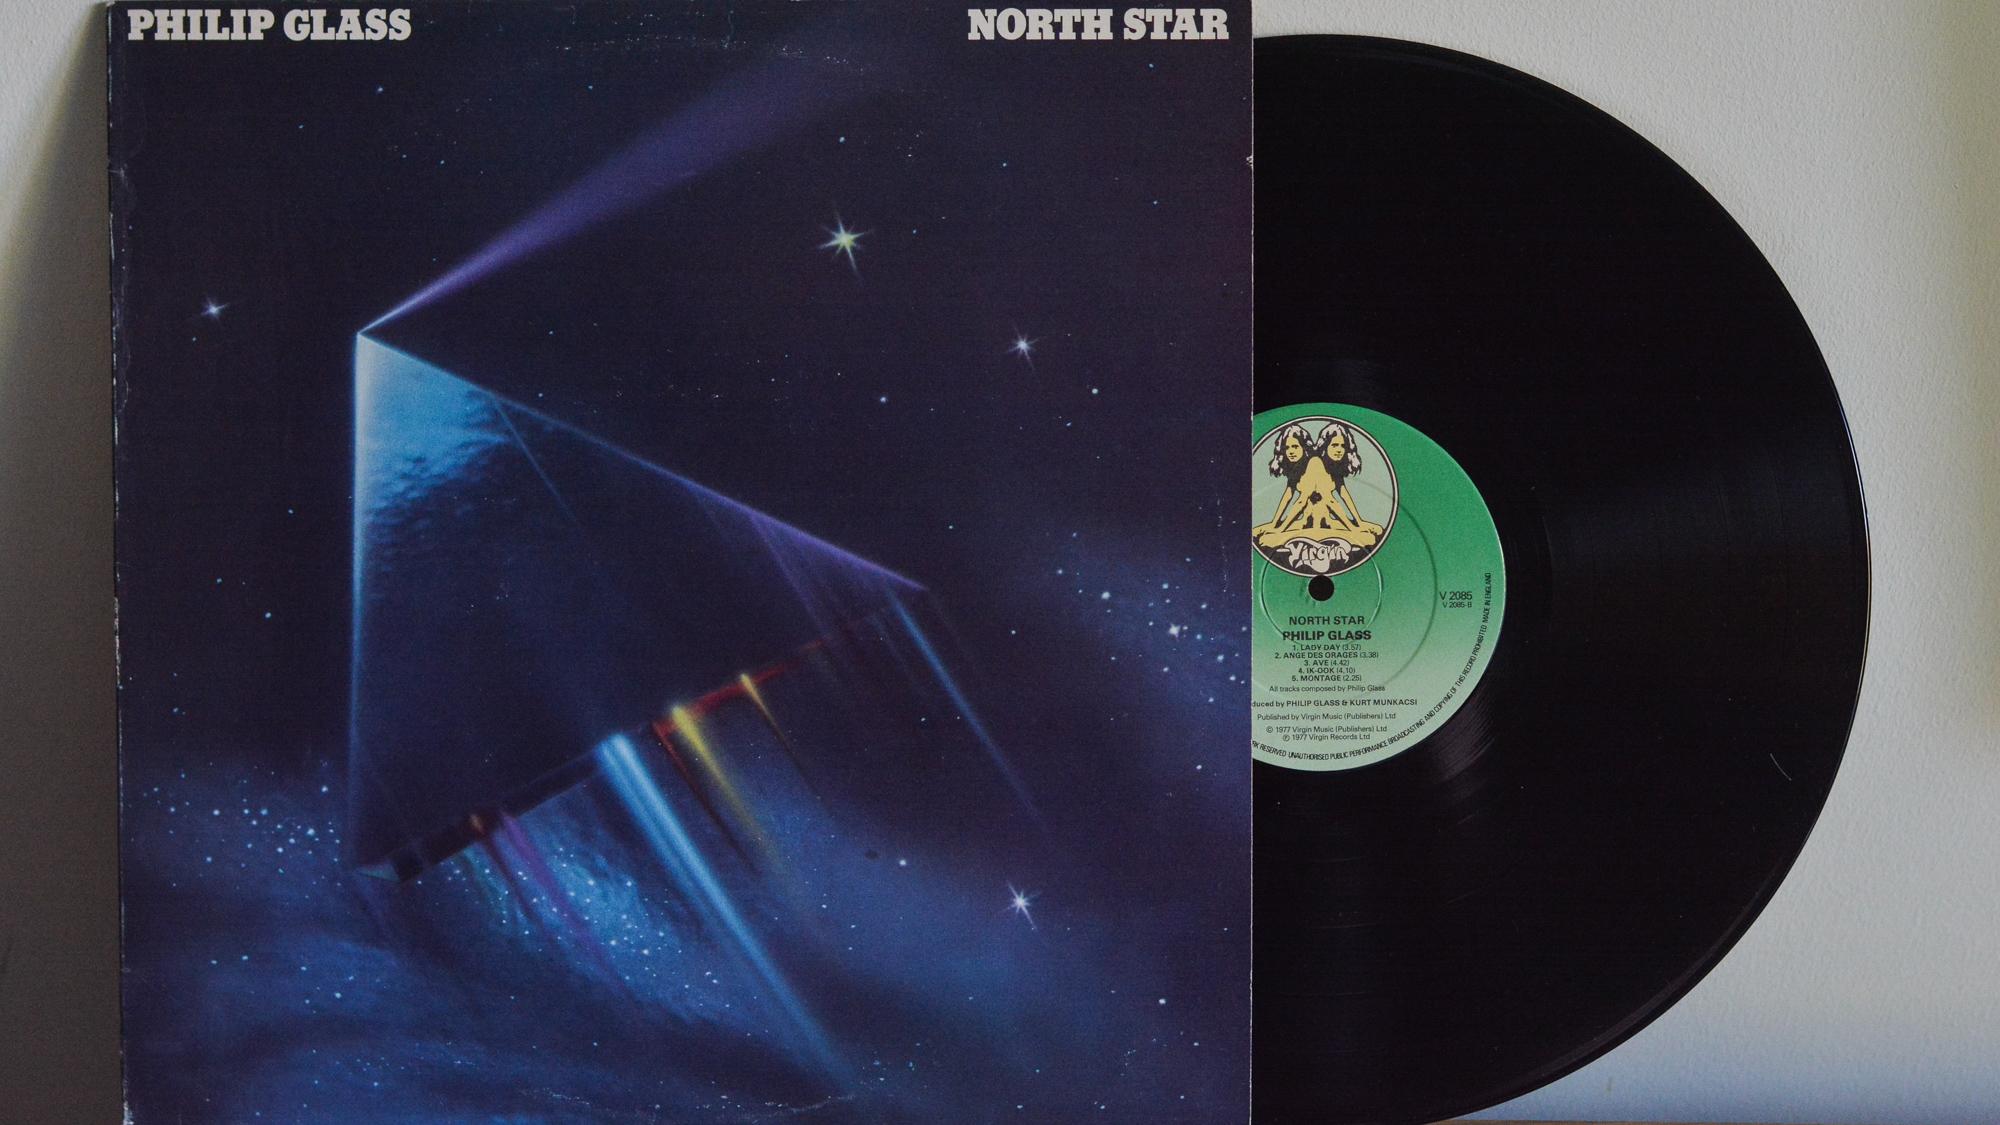 Philip Glass - North Star